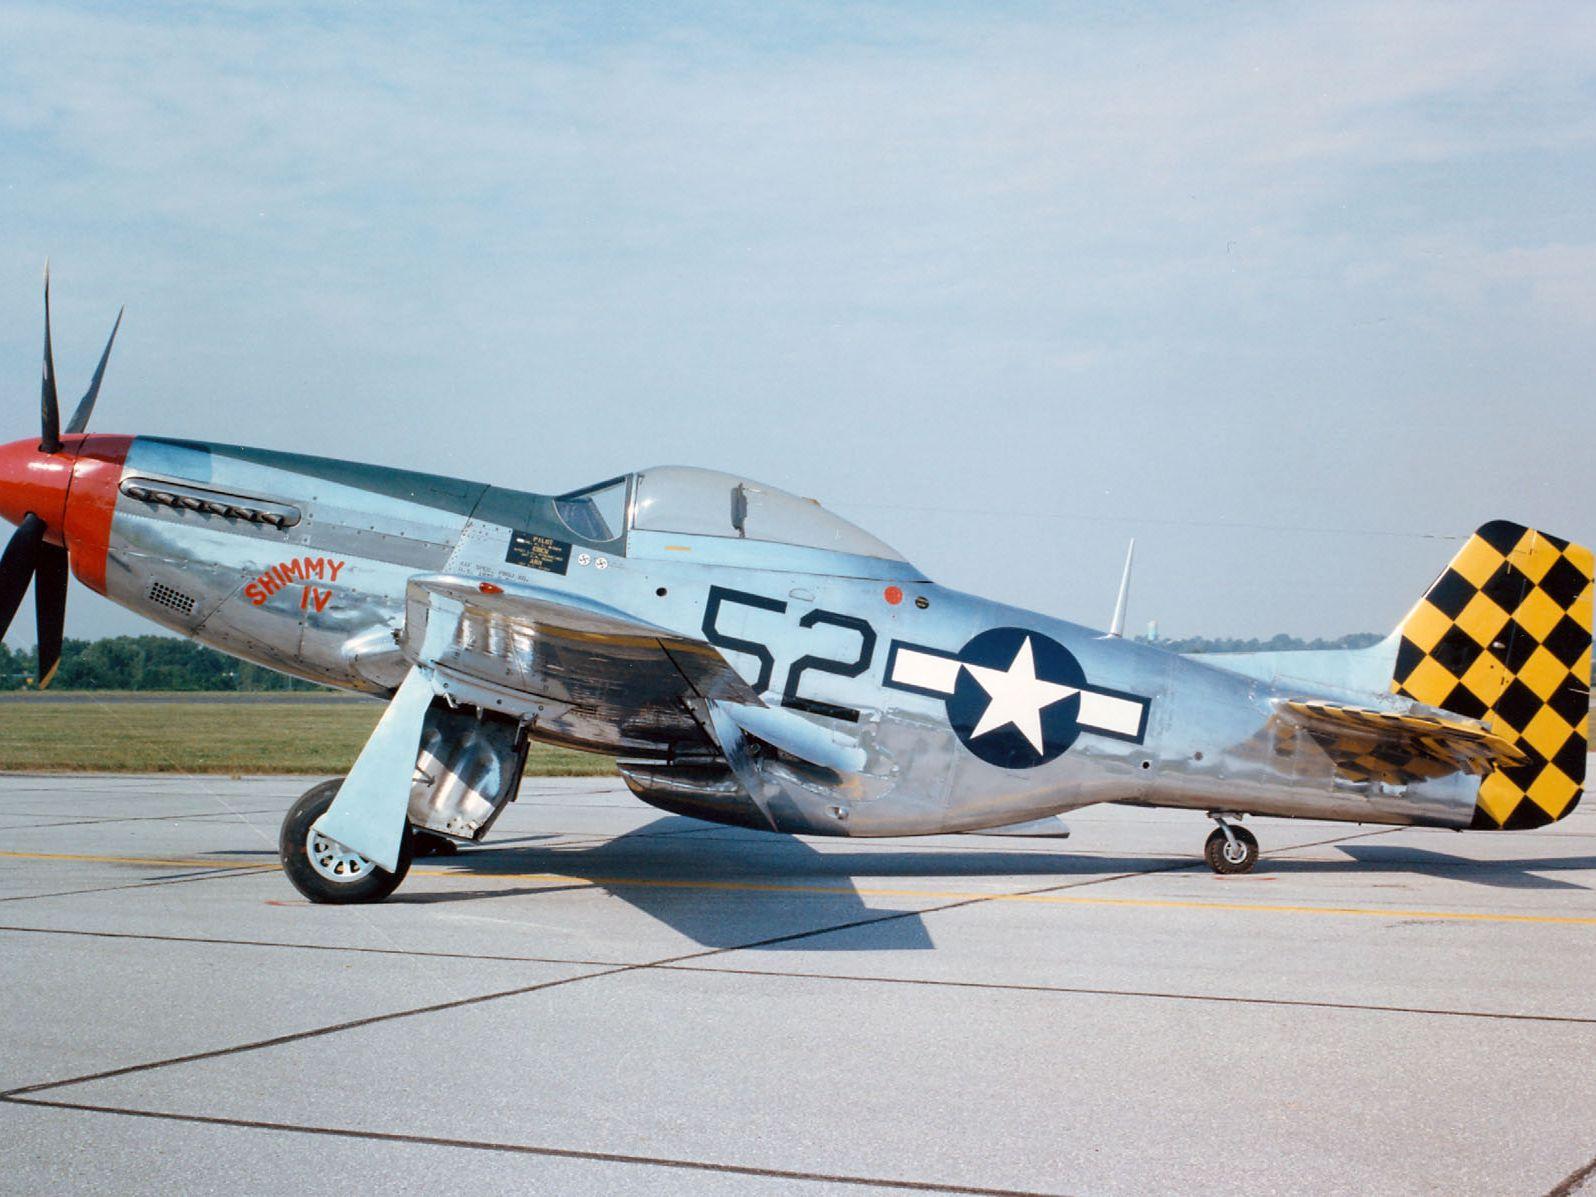 P-51 Mustang • United States • World War 2